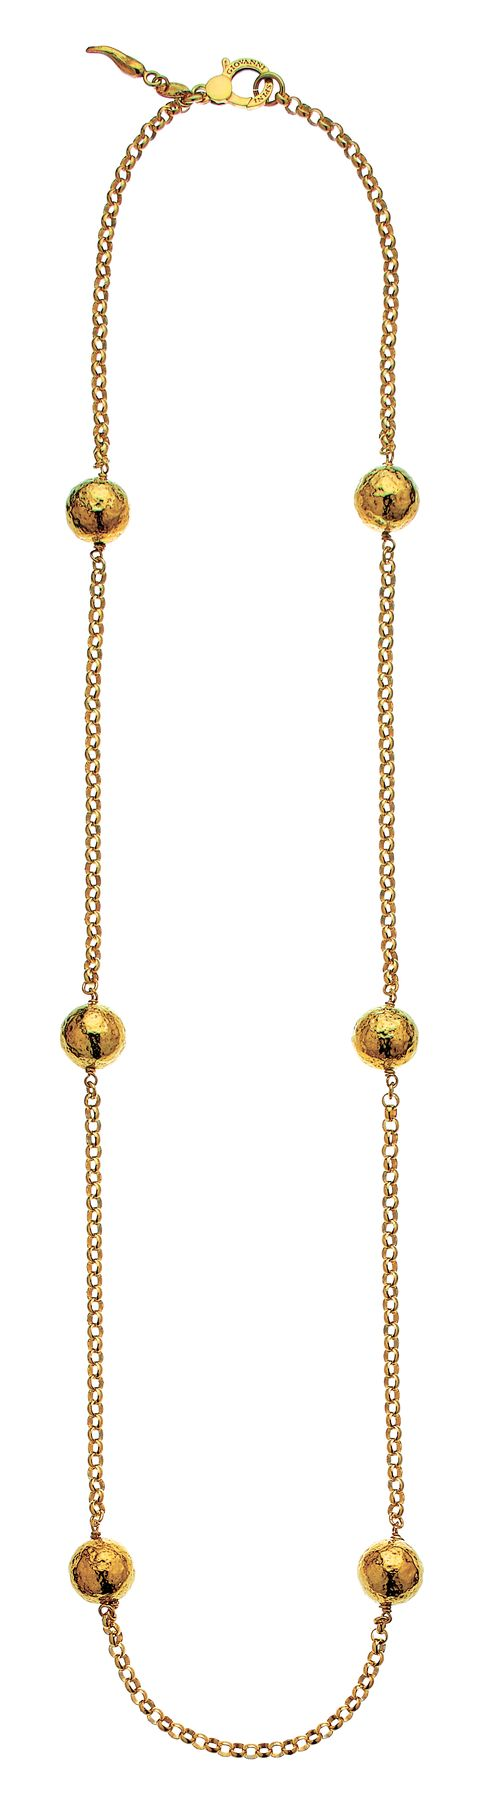 collana d'argento dorato